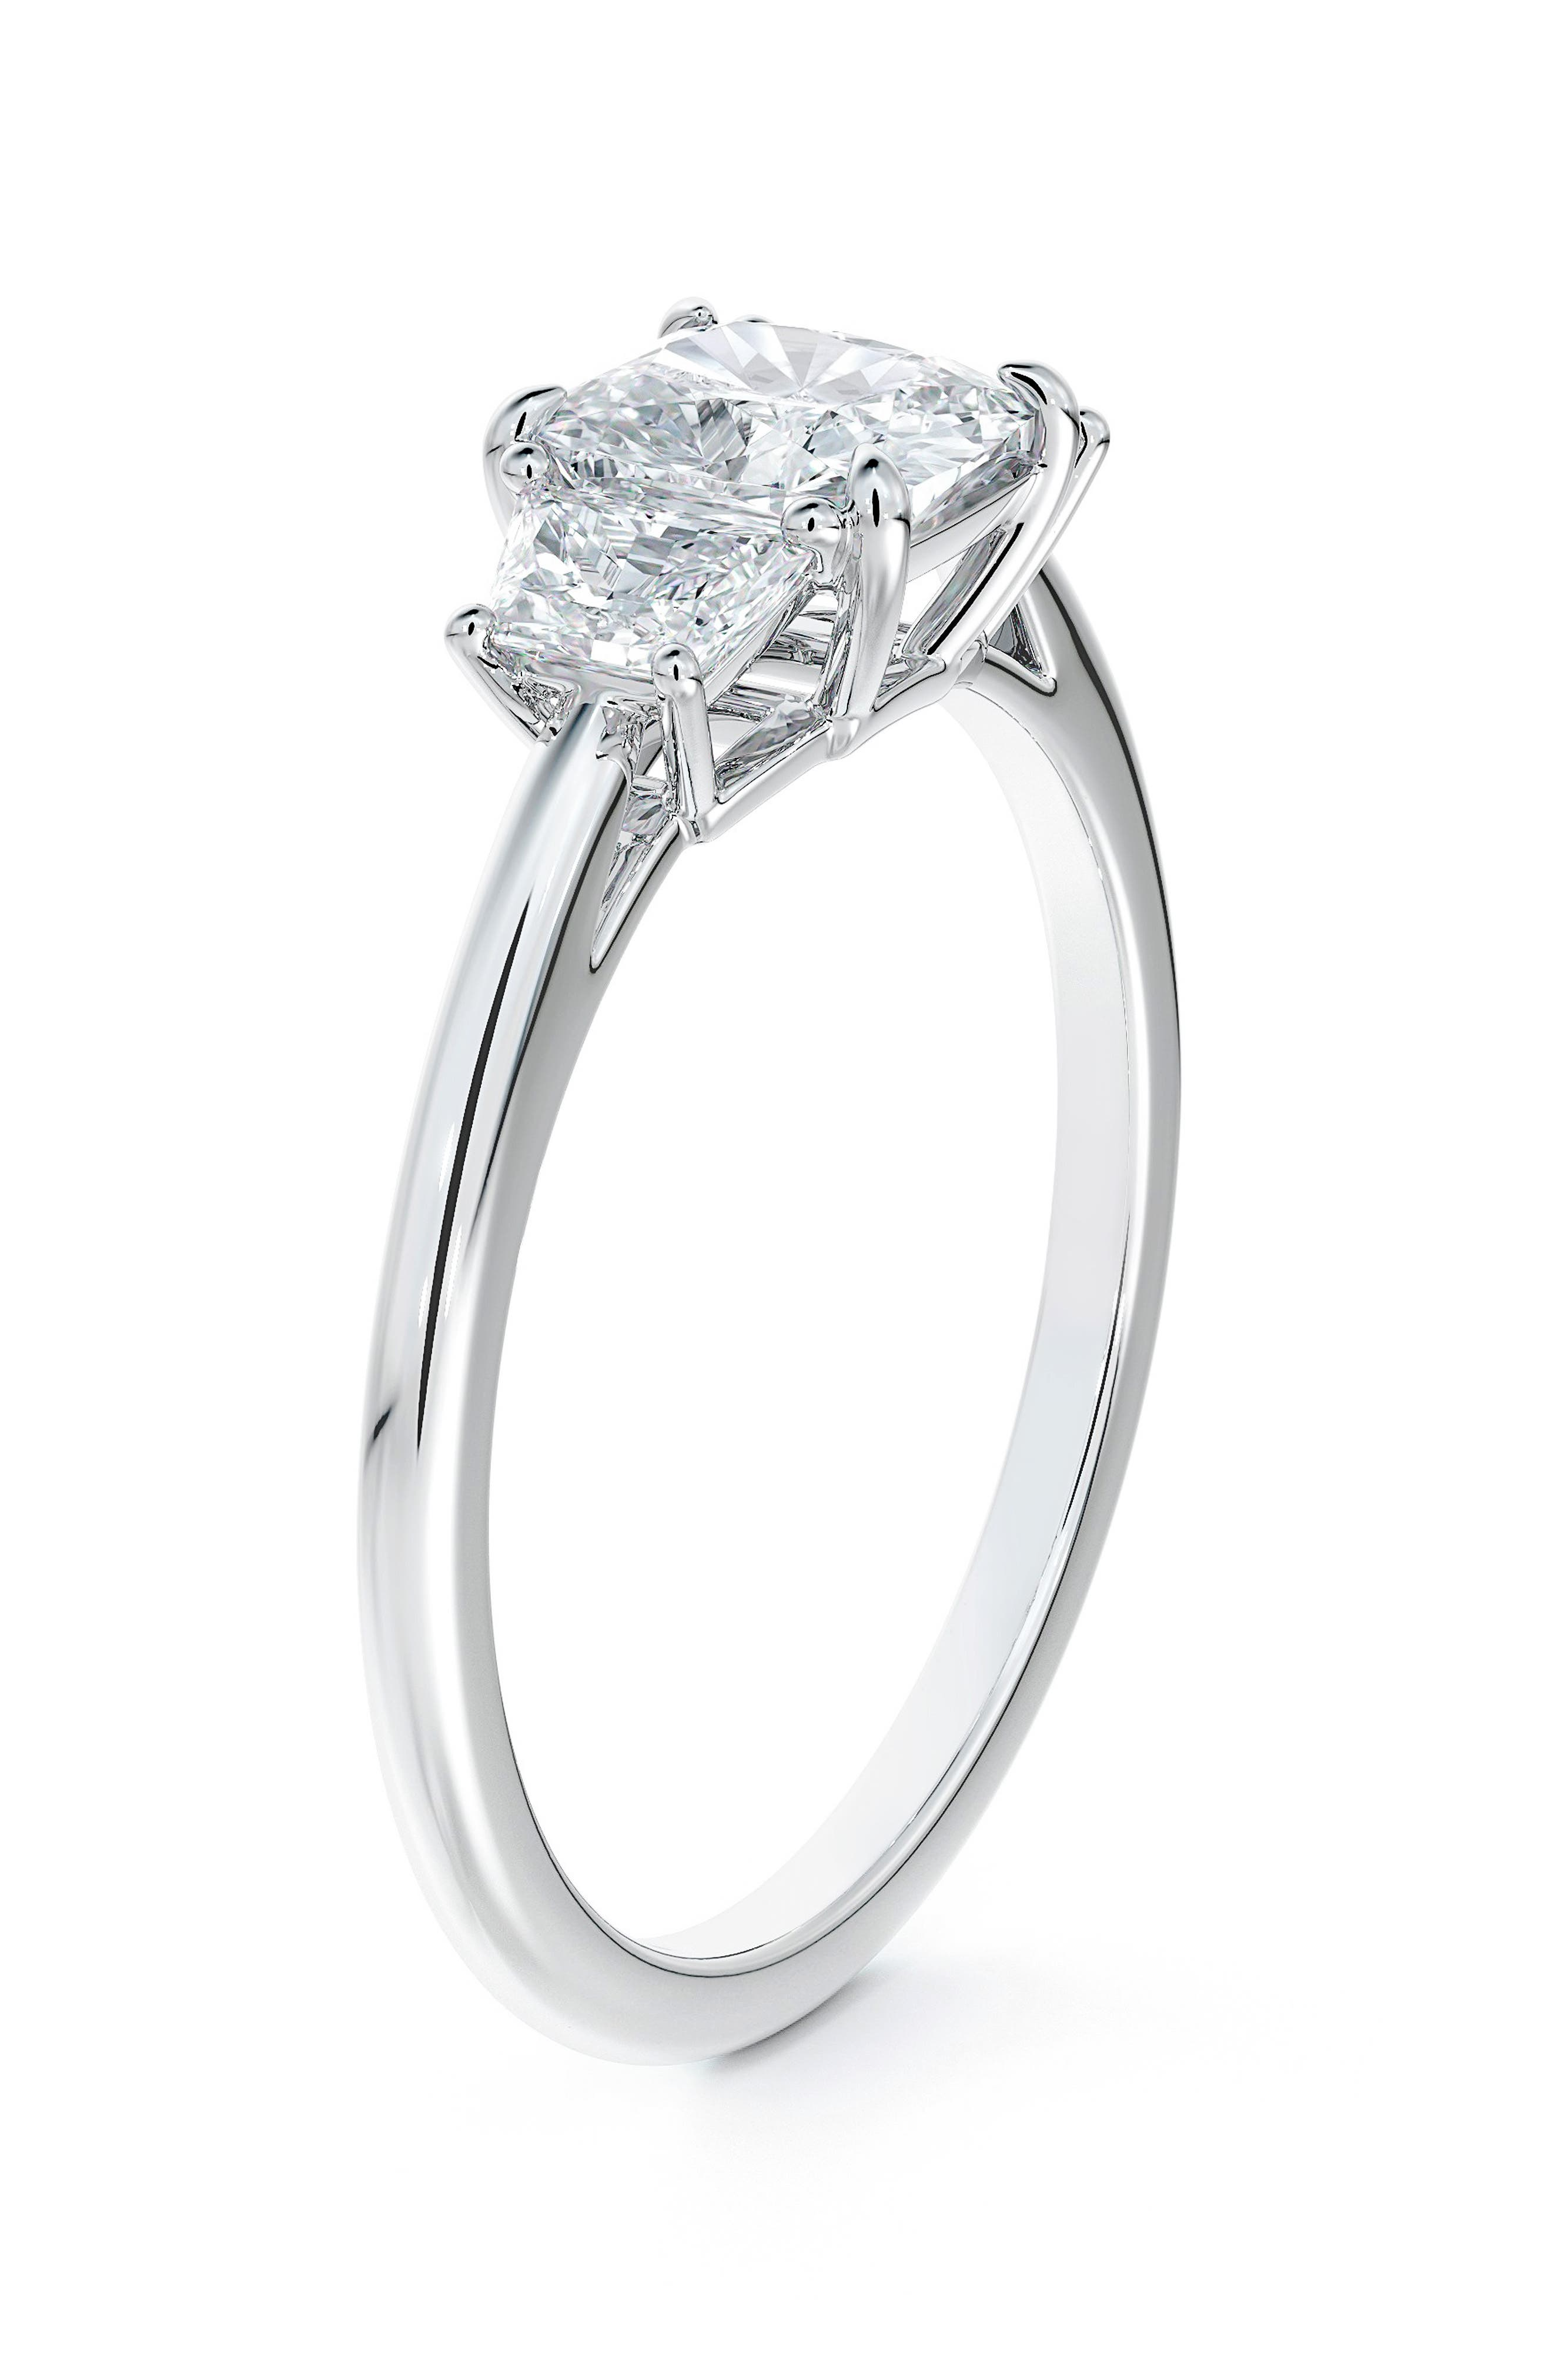 X Micaela Three Stone Illusion Diamond Engagement Ring